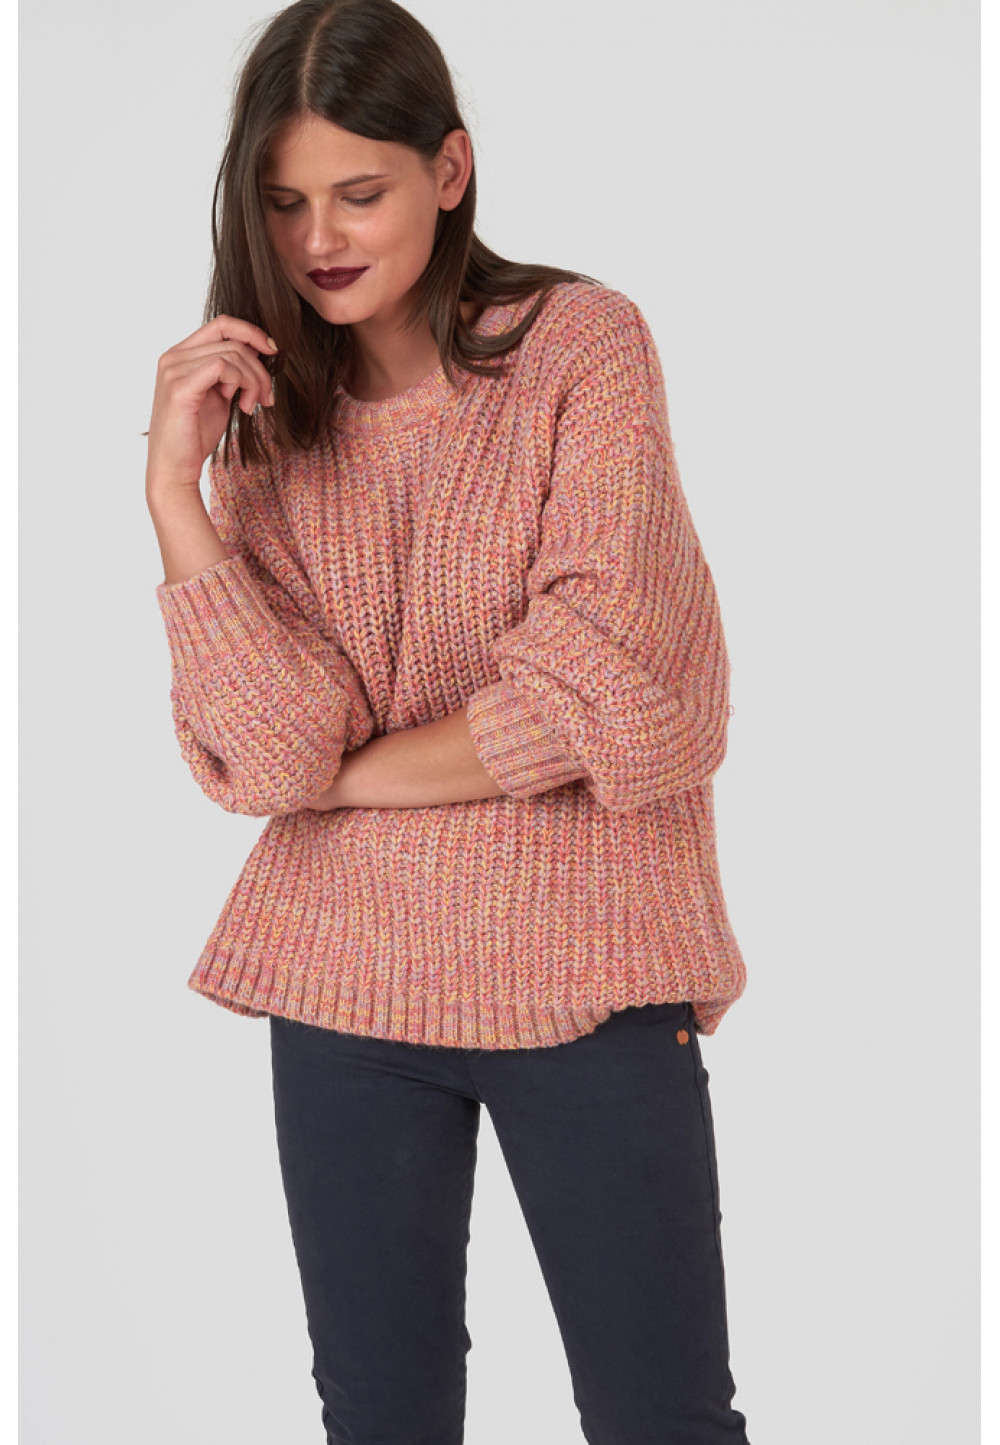 Вязаный широкий свитер